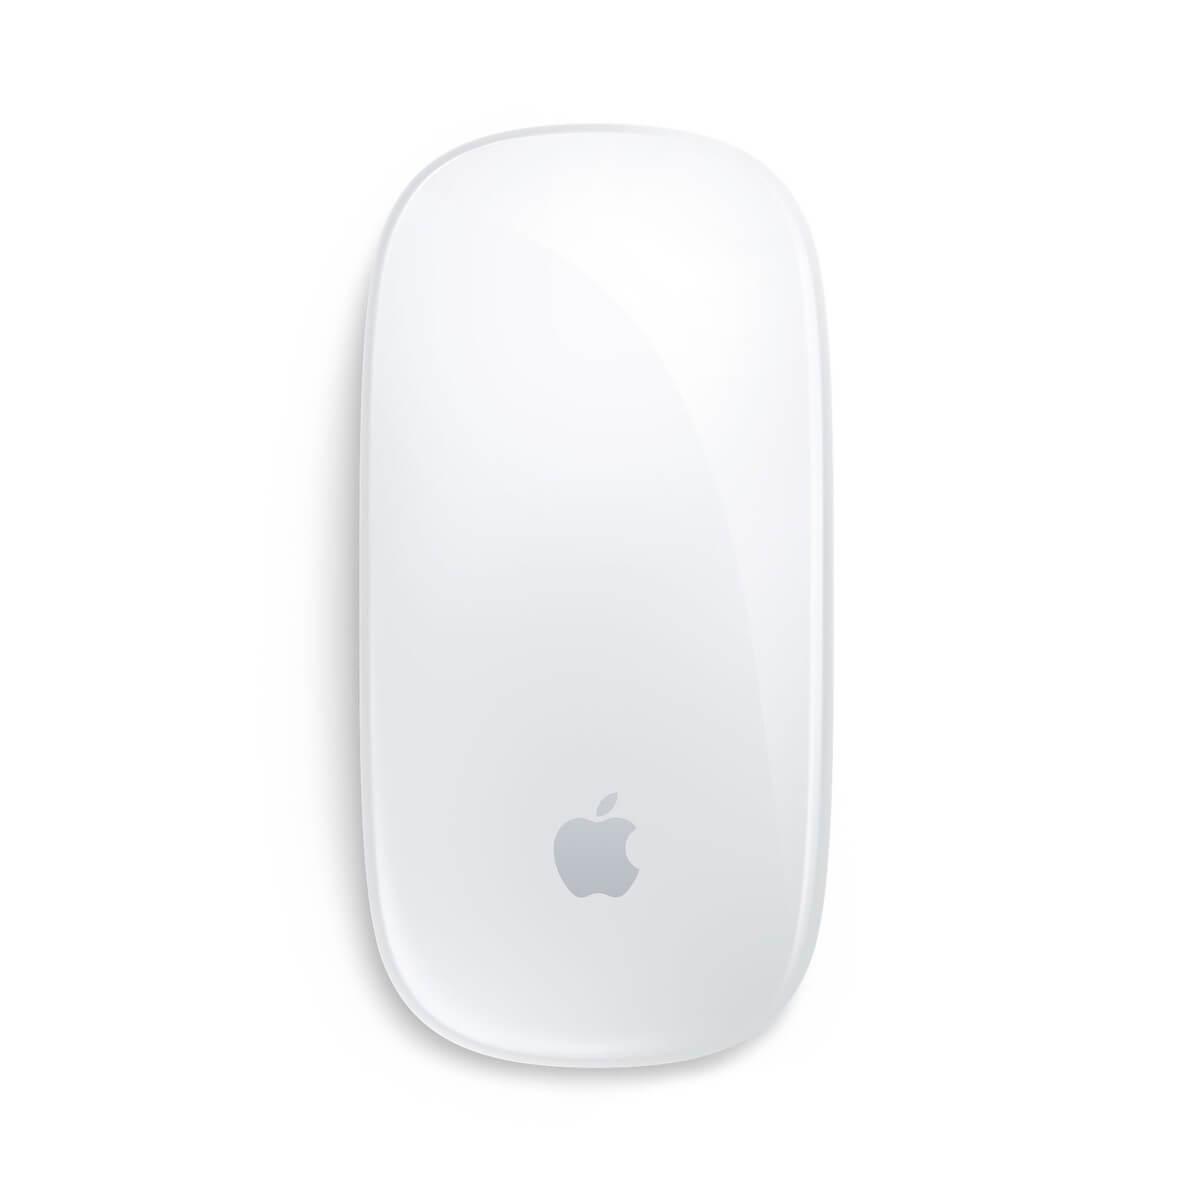 2 Apple Magic Mouse 2 Best MacBook Air Accessories